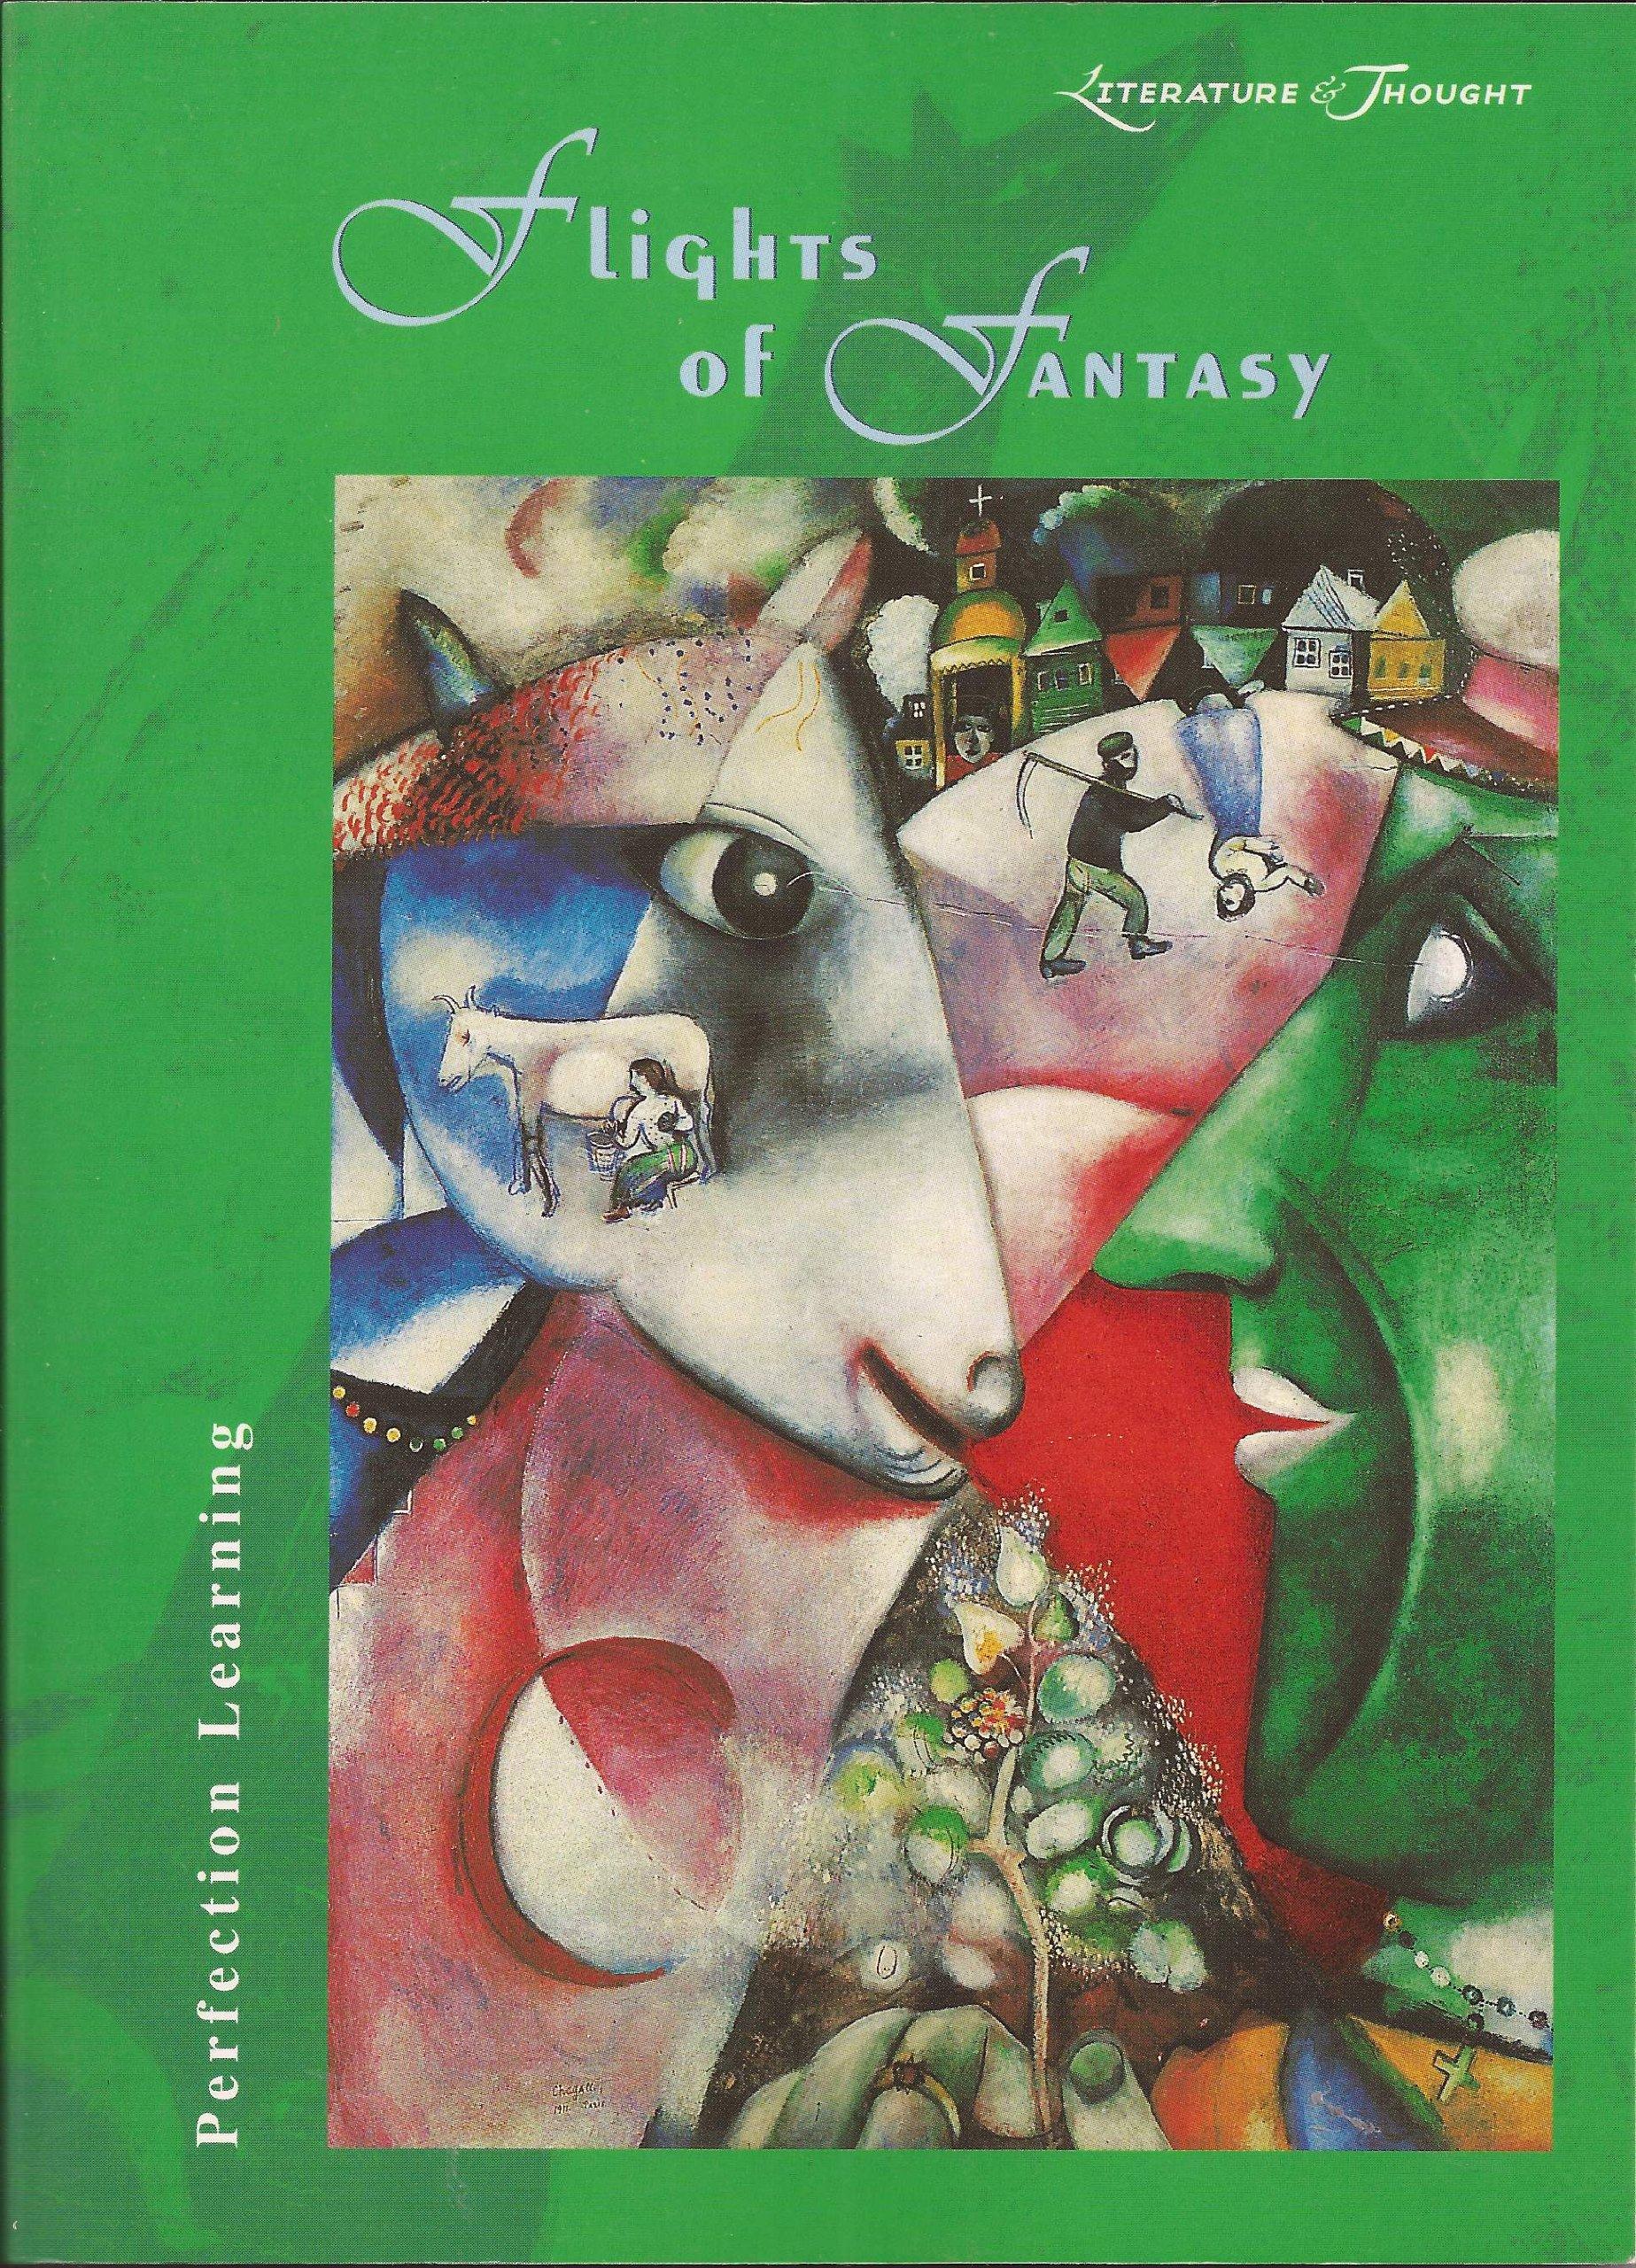 Flights of Fantasy (Literature & Thought) Text fb2 ebook